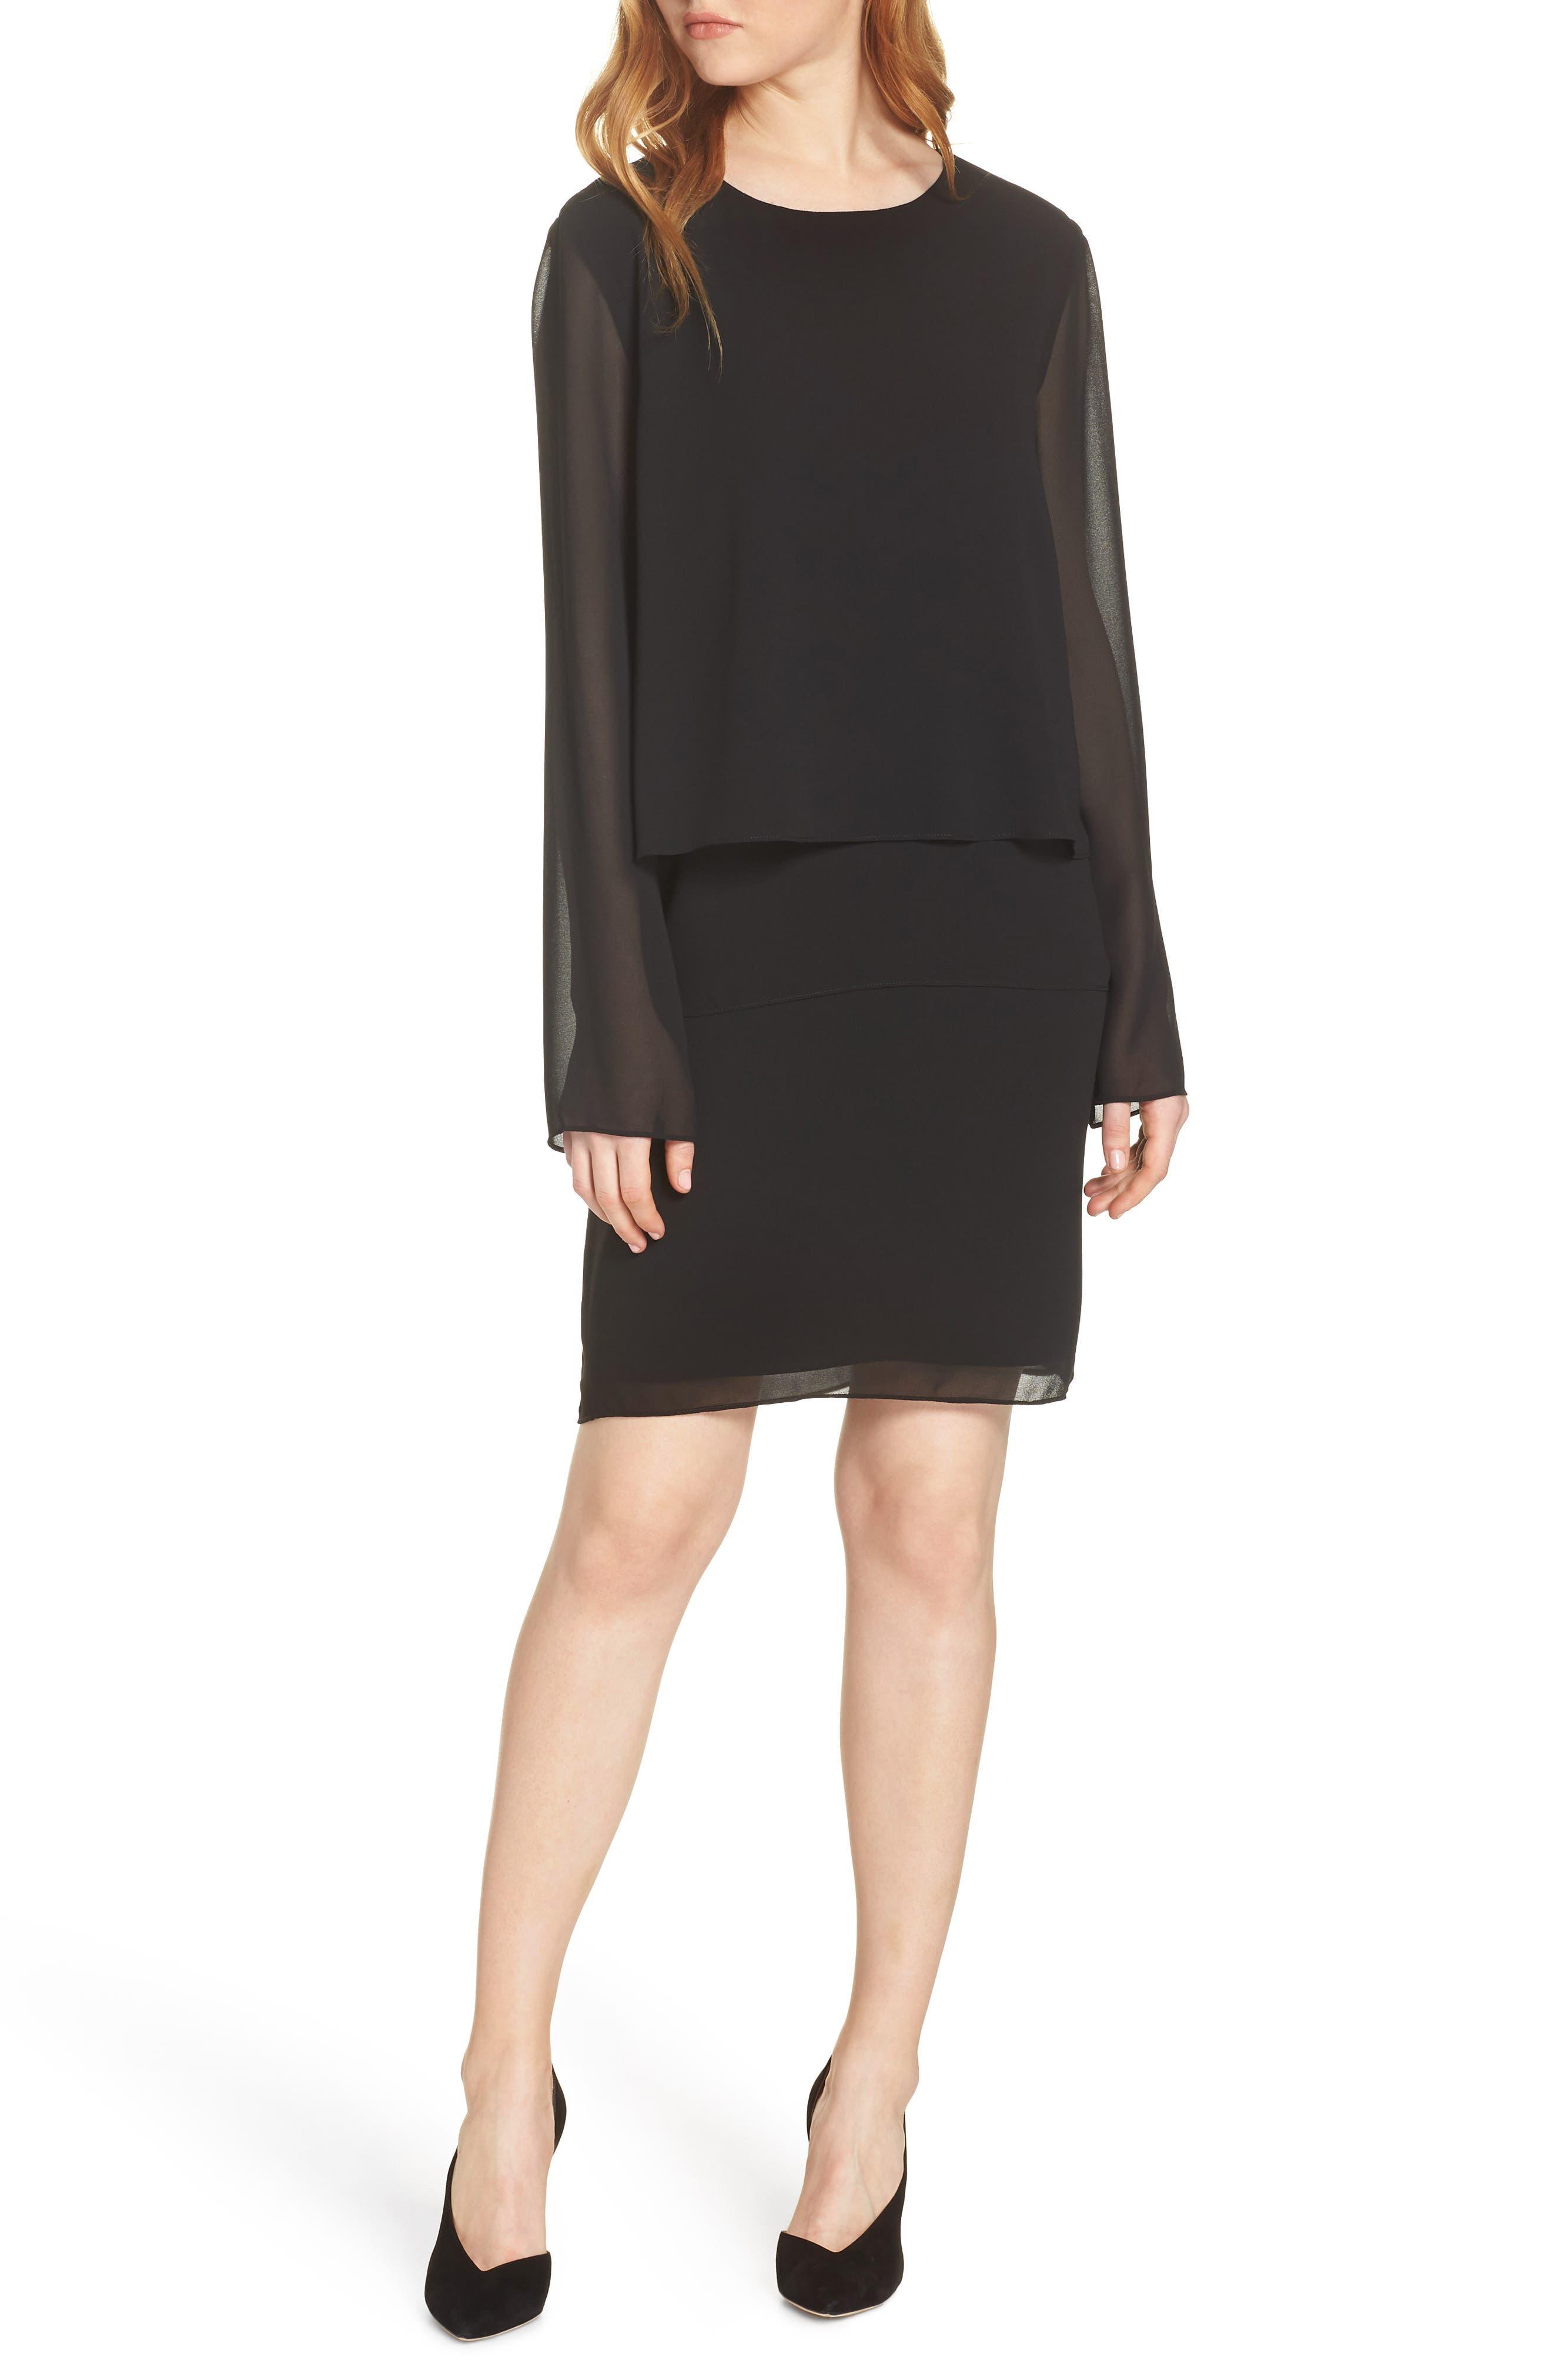 CHARLES HENRY, Layered Popover Chiffon Dress, Main thumbnail 1, color, 001